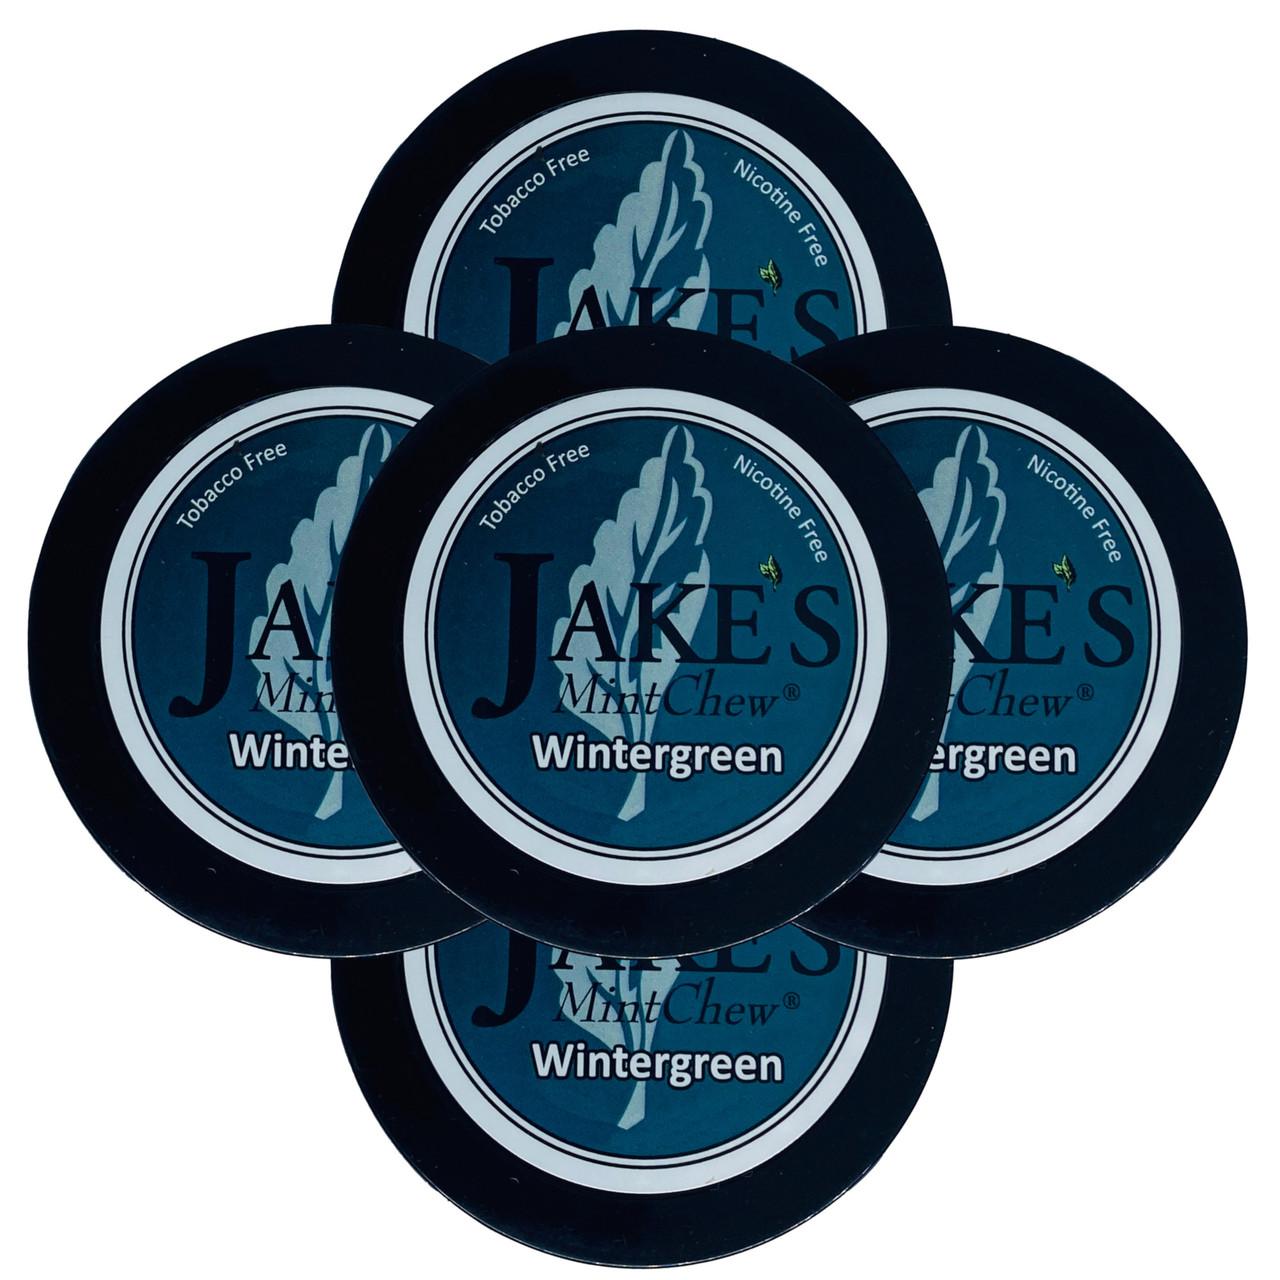 Jake's Mint Herbal Chew Wintergreen 5 Cans